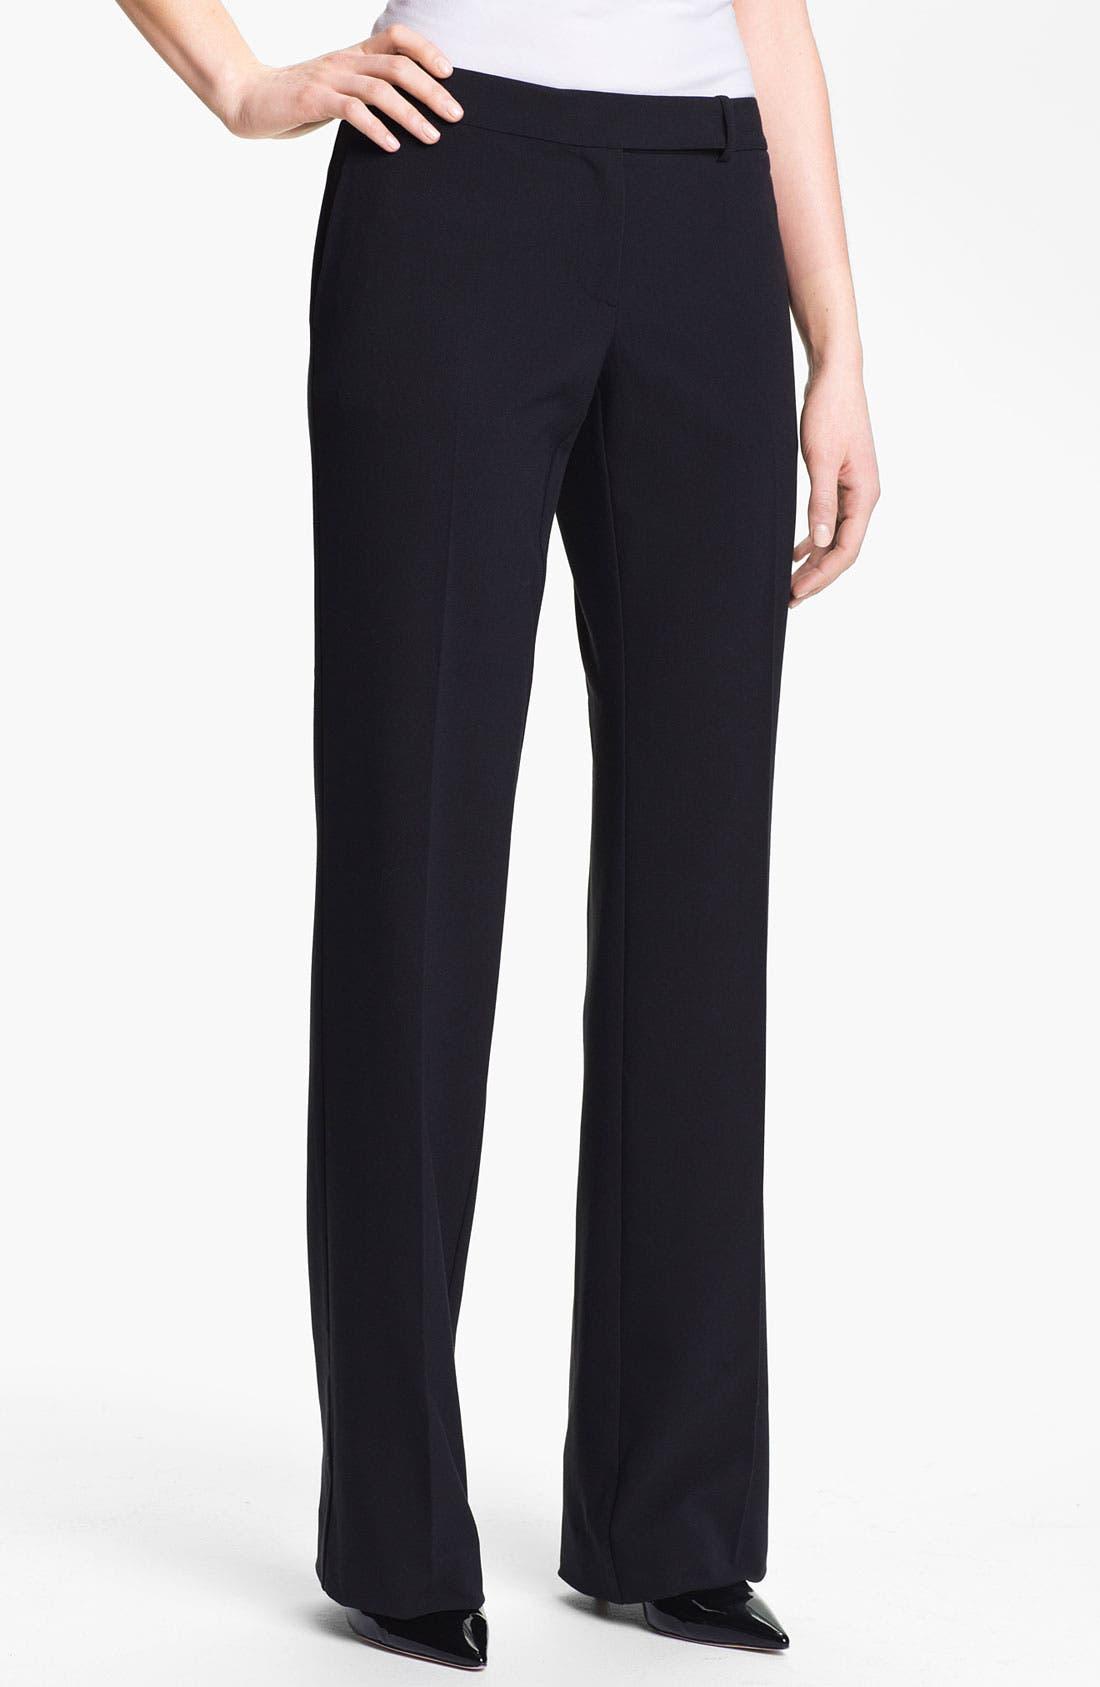 Main Image - Isaac Mizrahi New York Stretch Woven Trousers